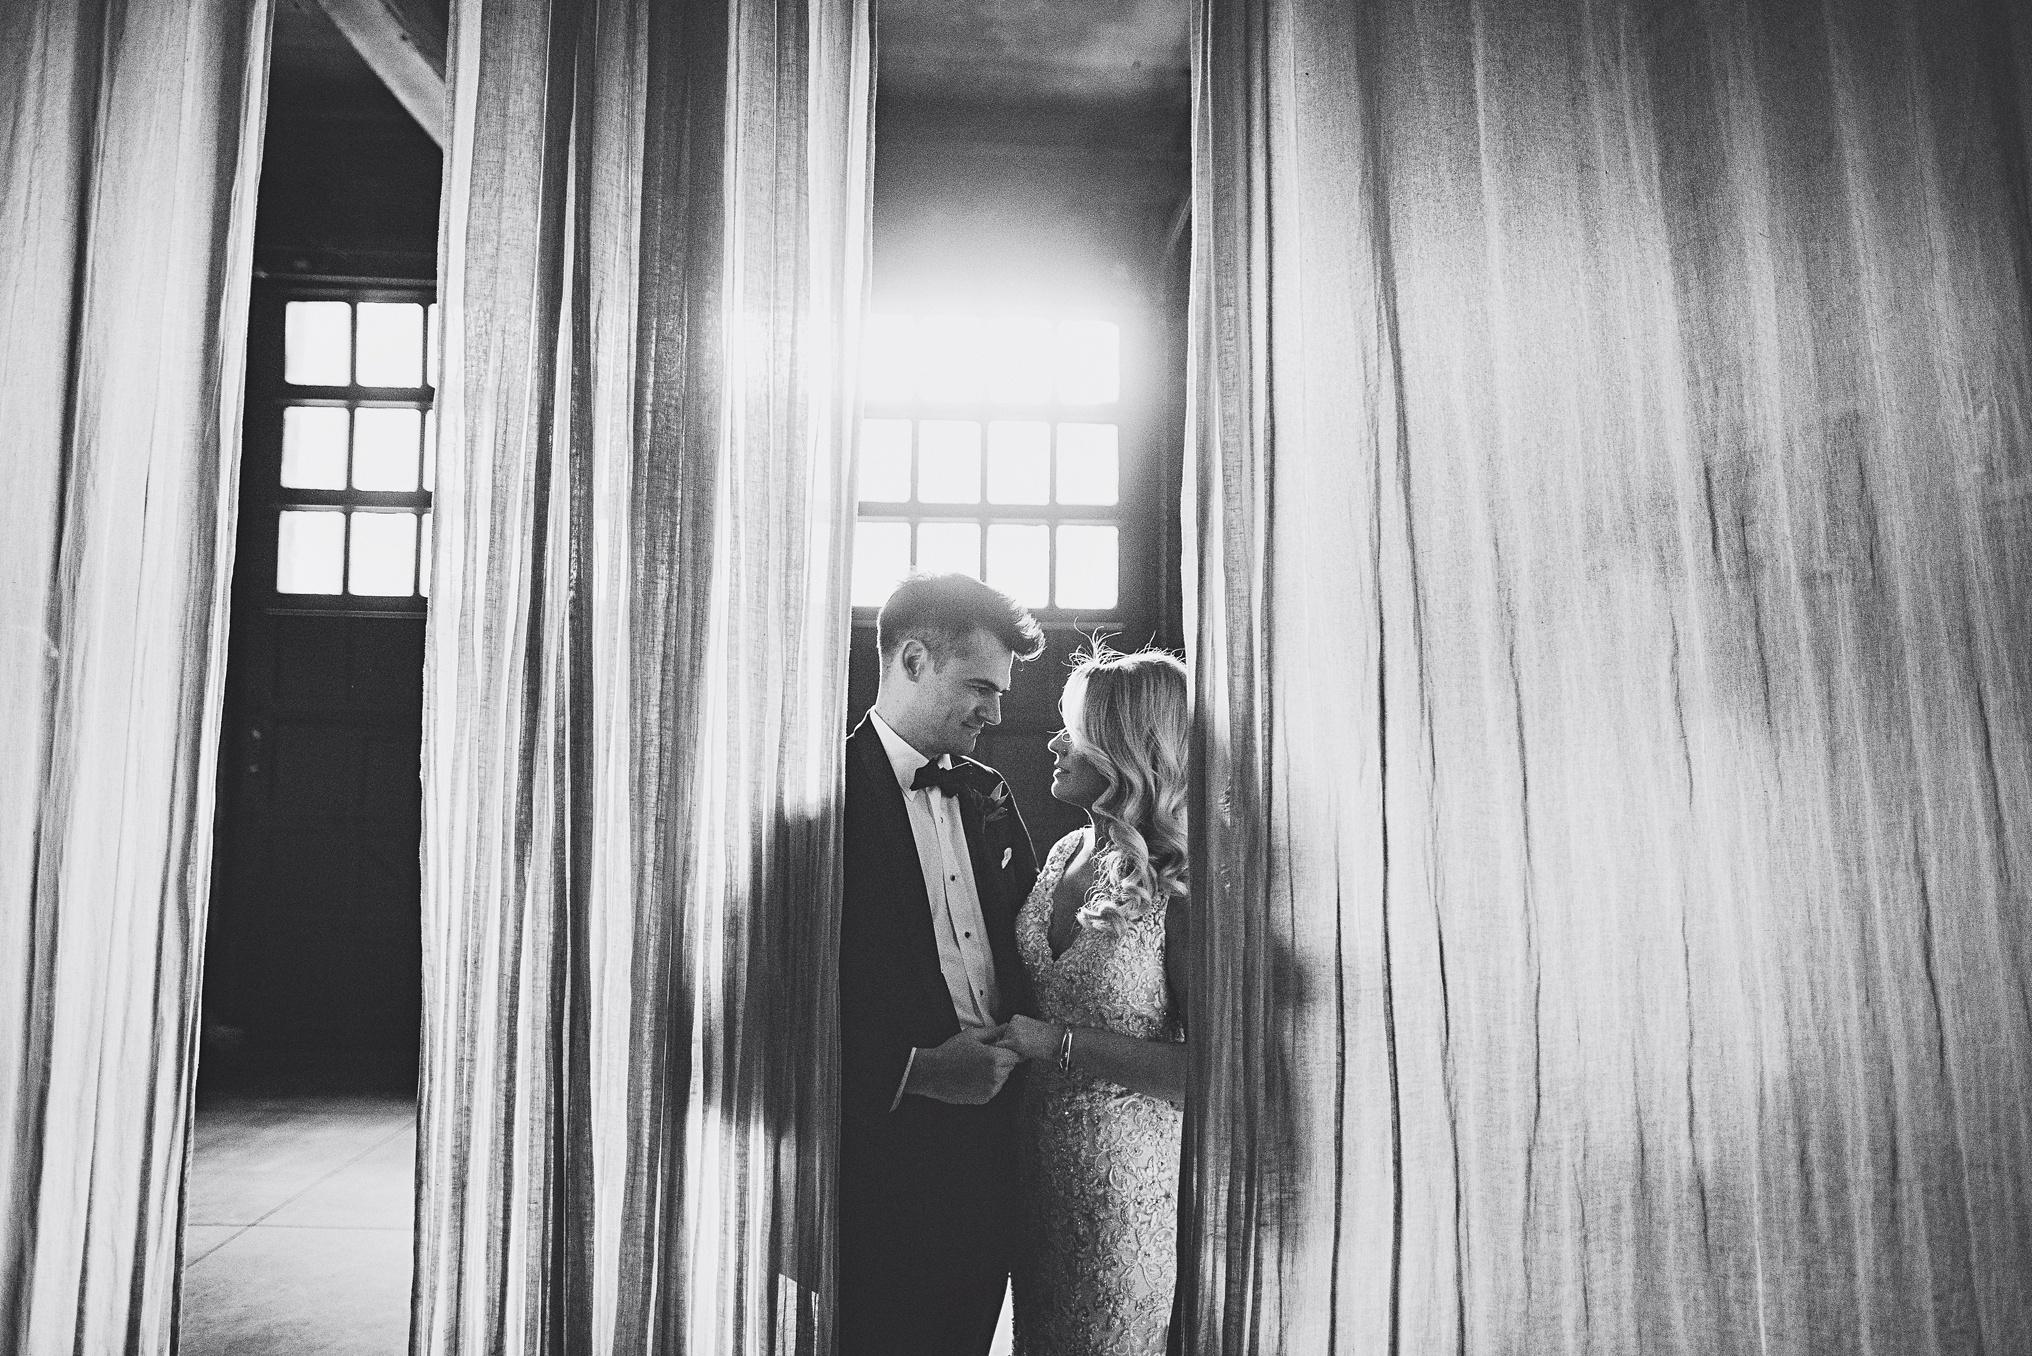 best_wedding_photography_2017_by_lucas_botz_photography_027.jpg